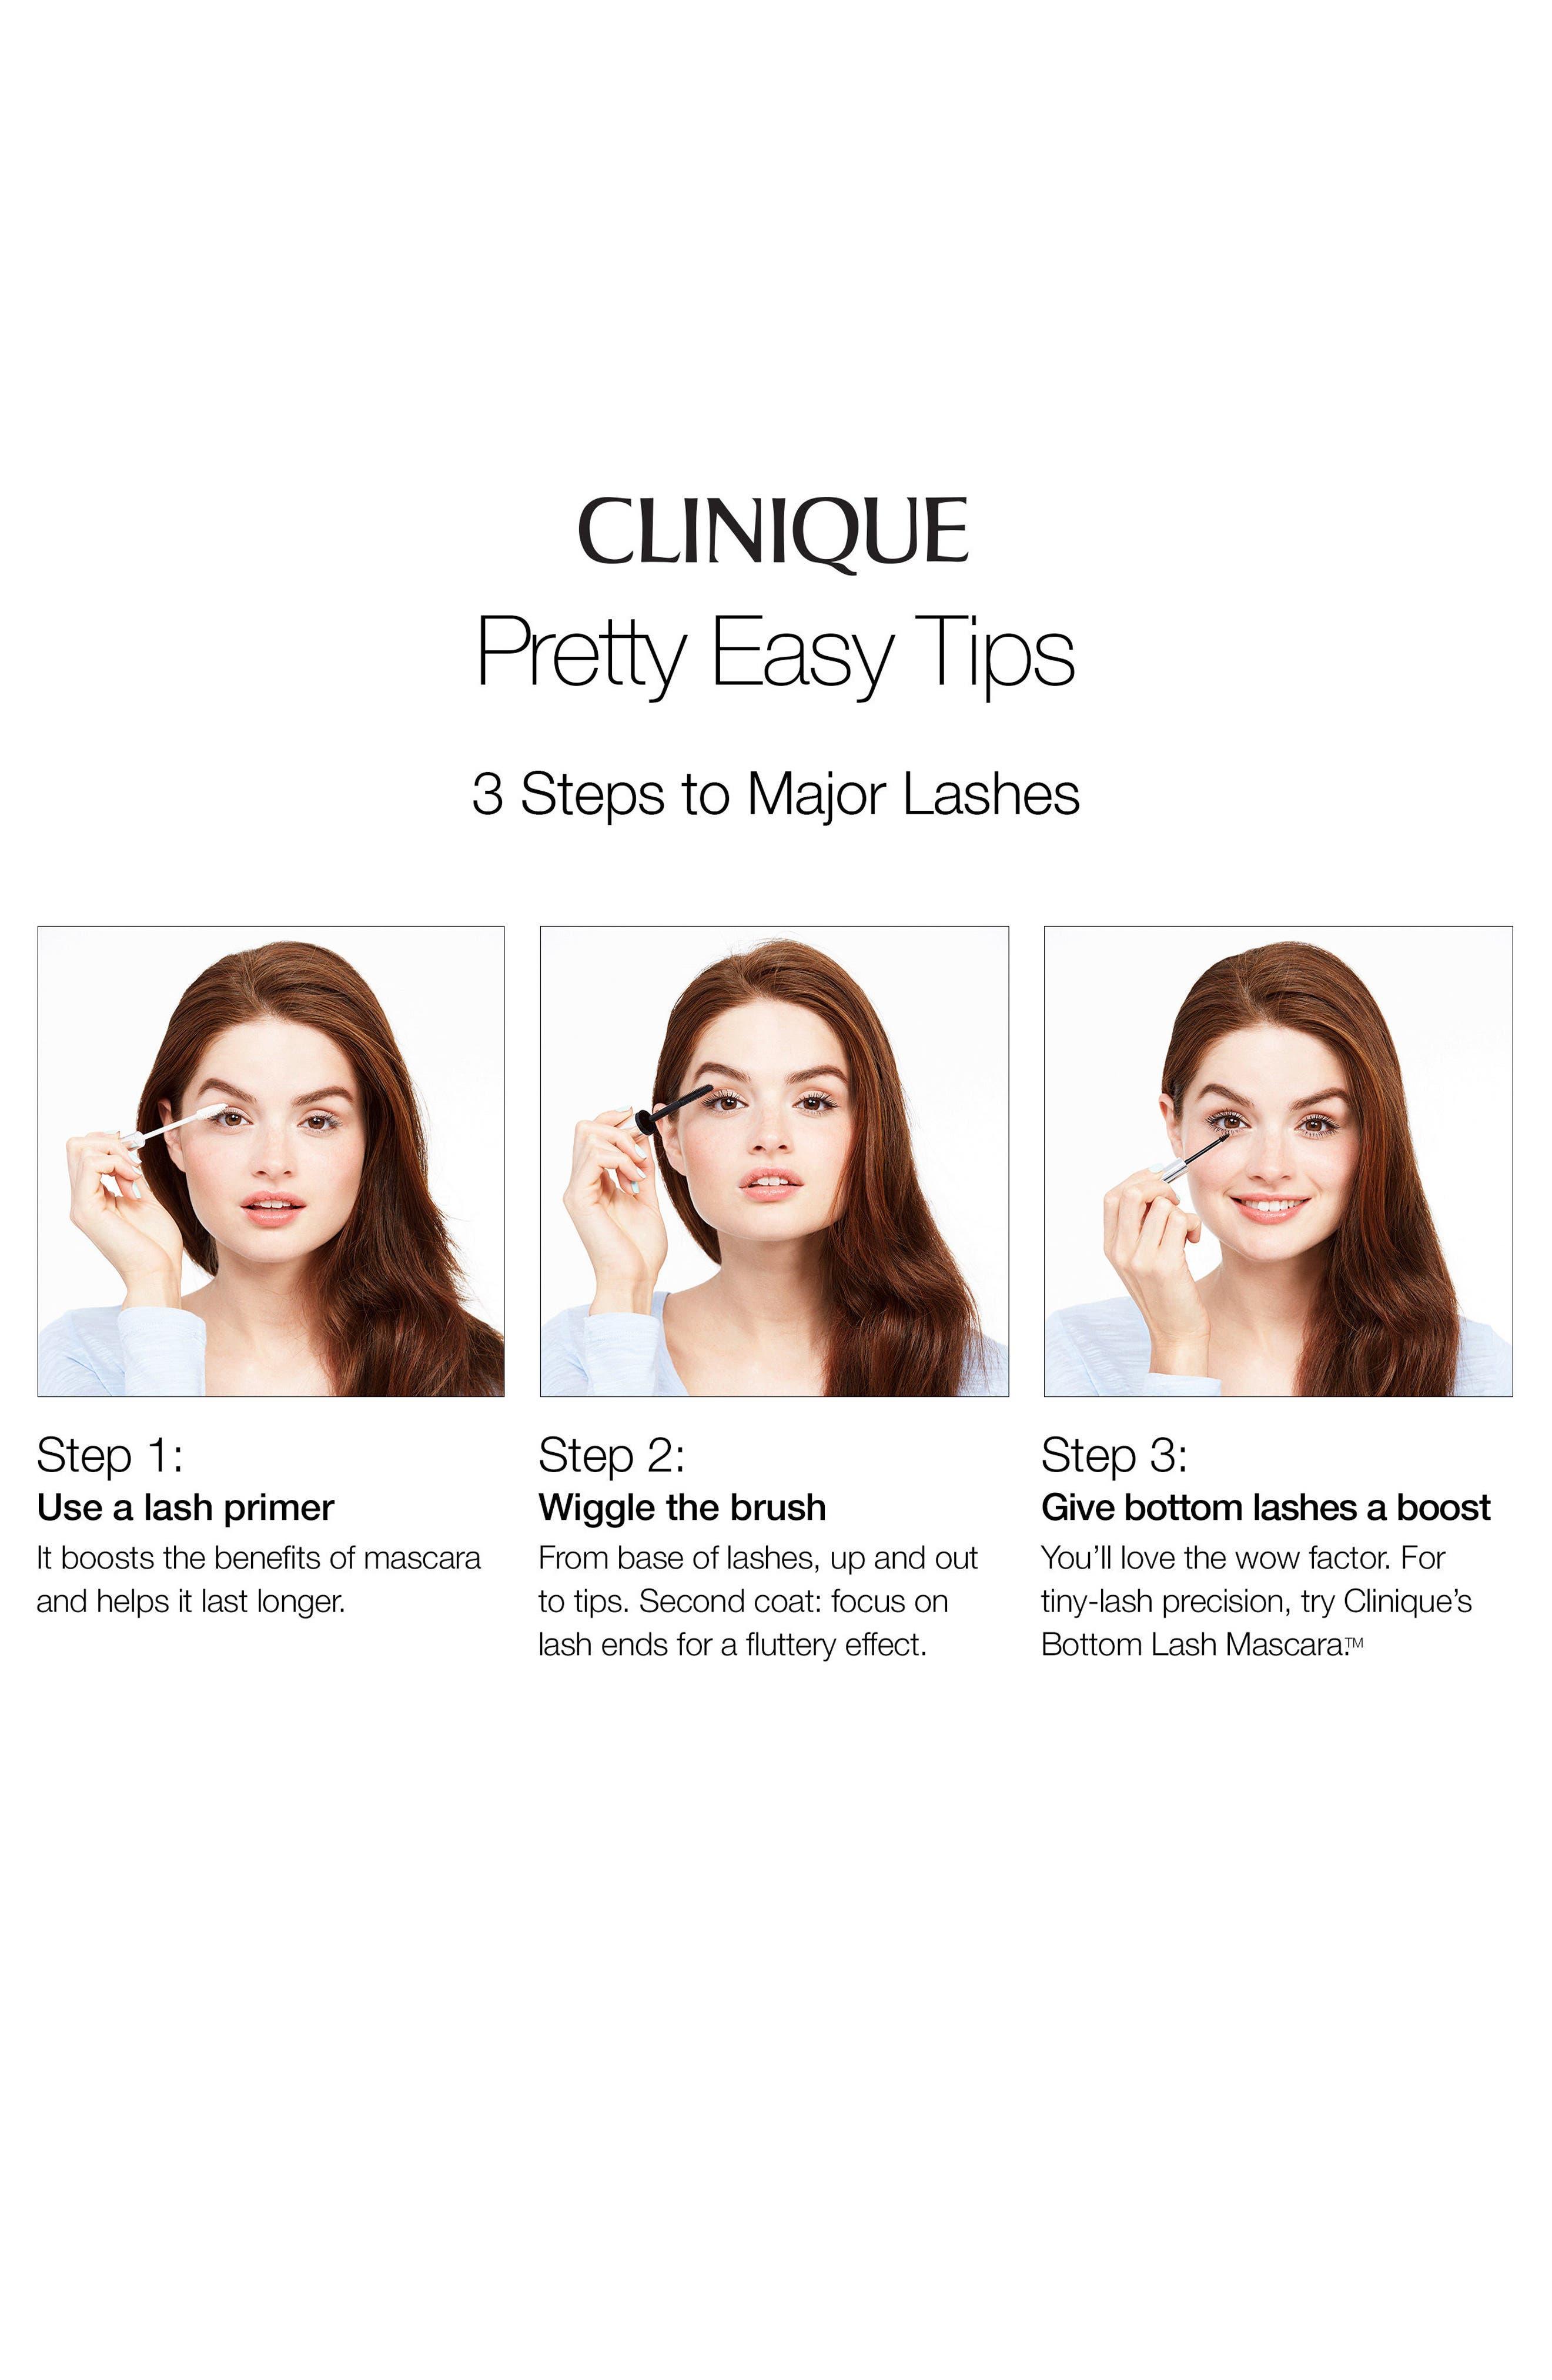 CLINIQUE Bottom Lash Mascara, Main, color, 001